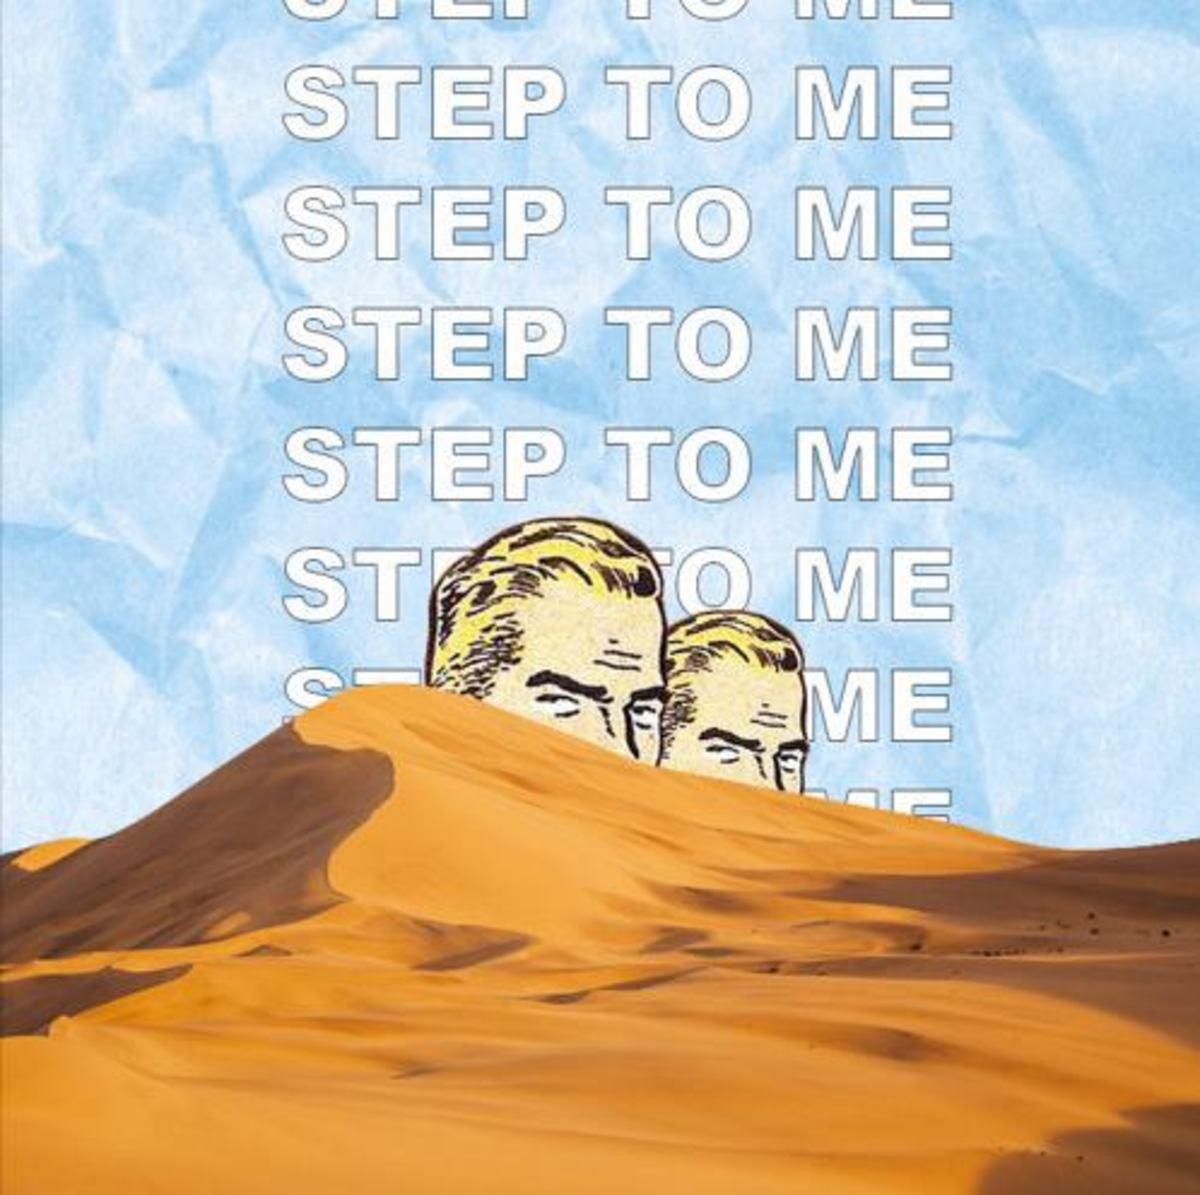 kkami bad one step to me